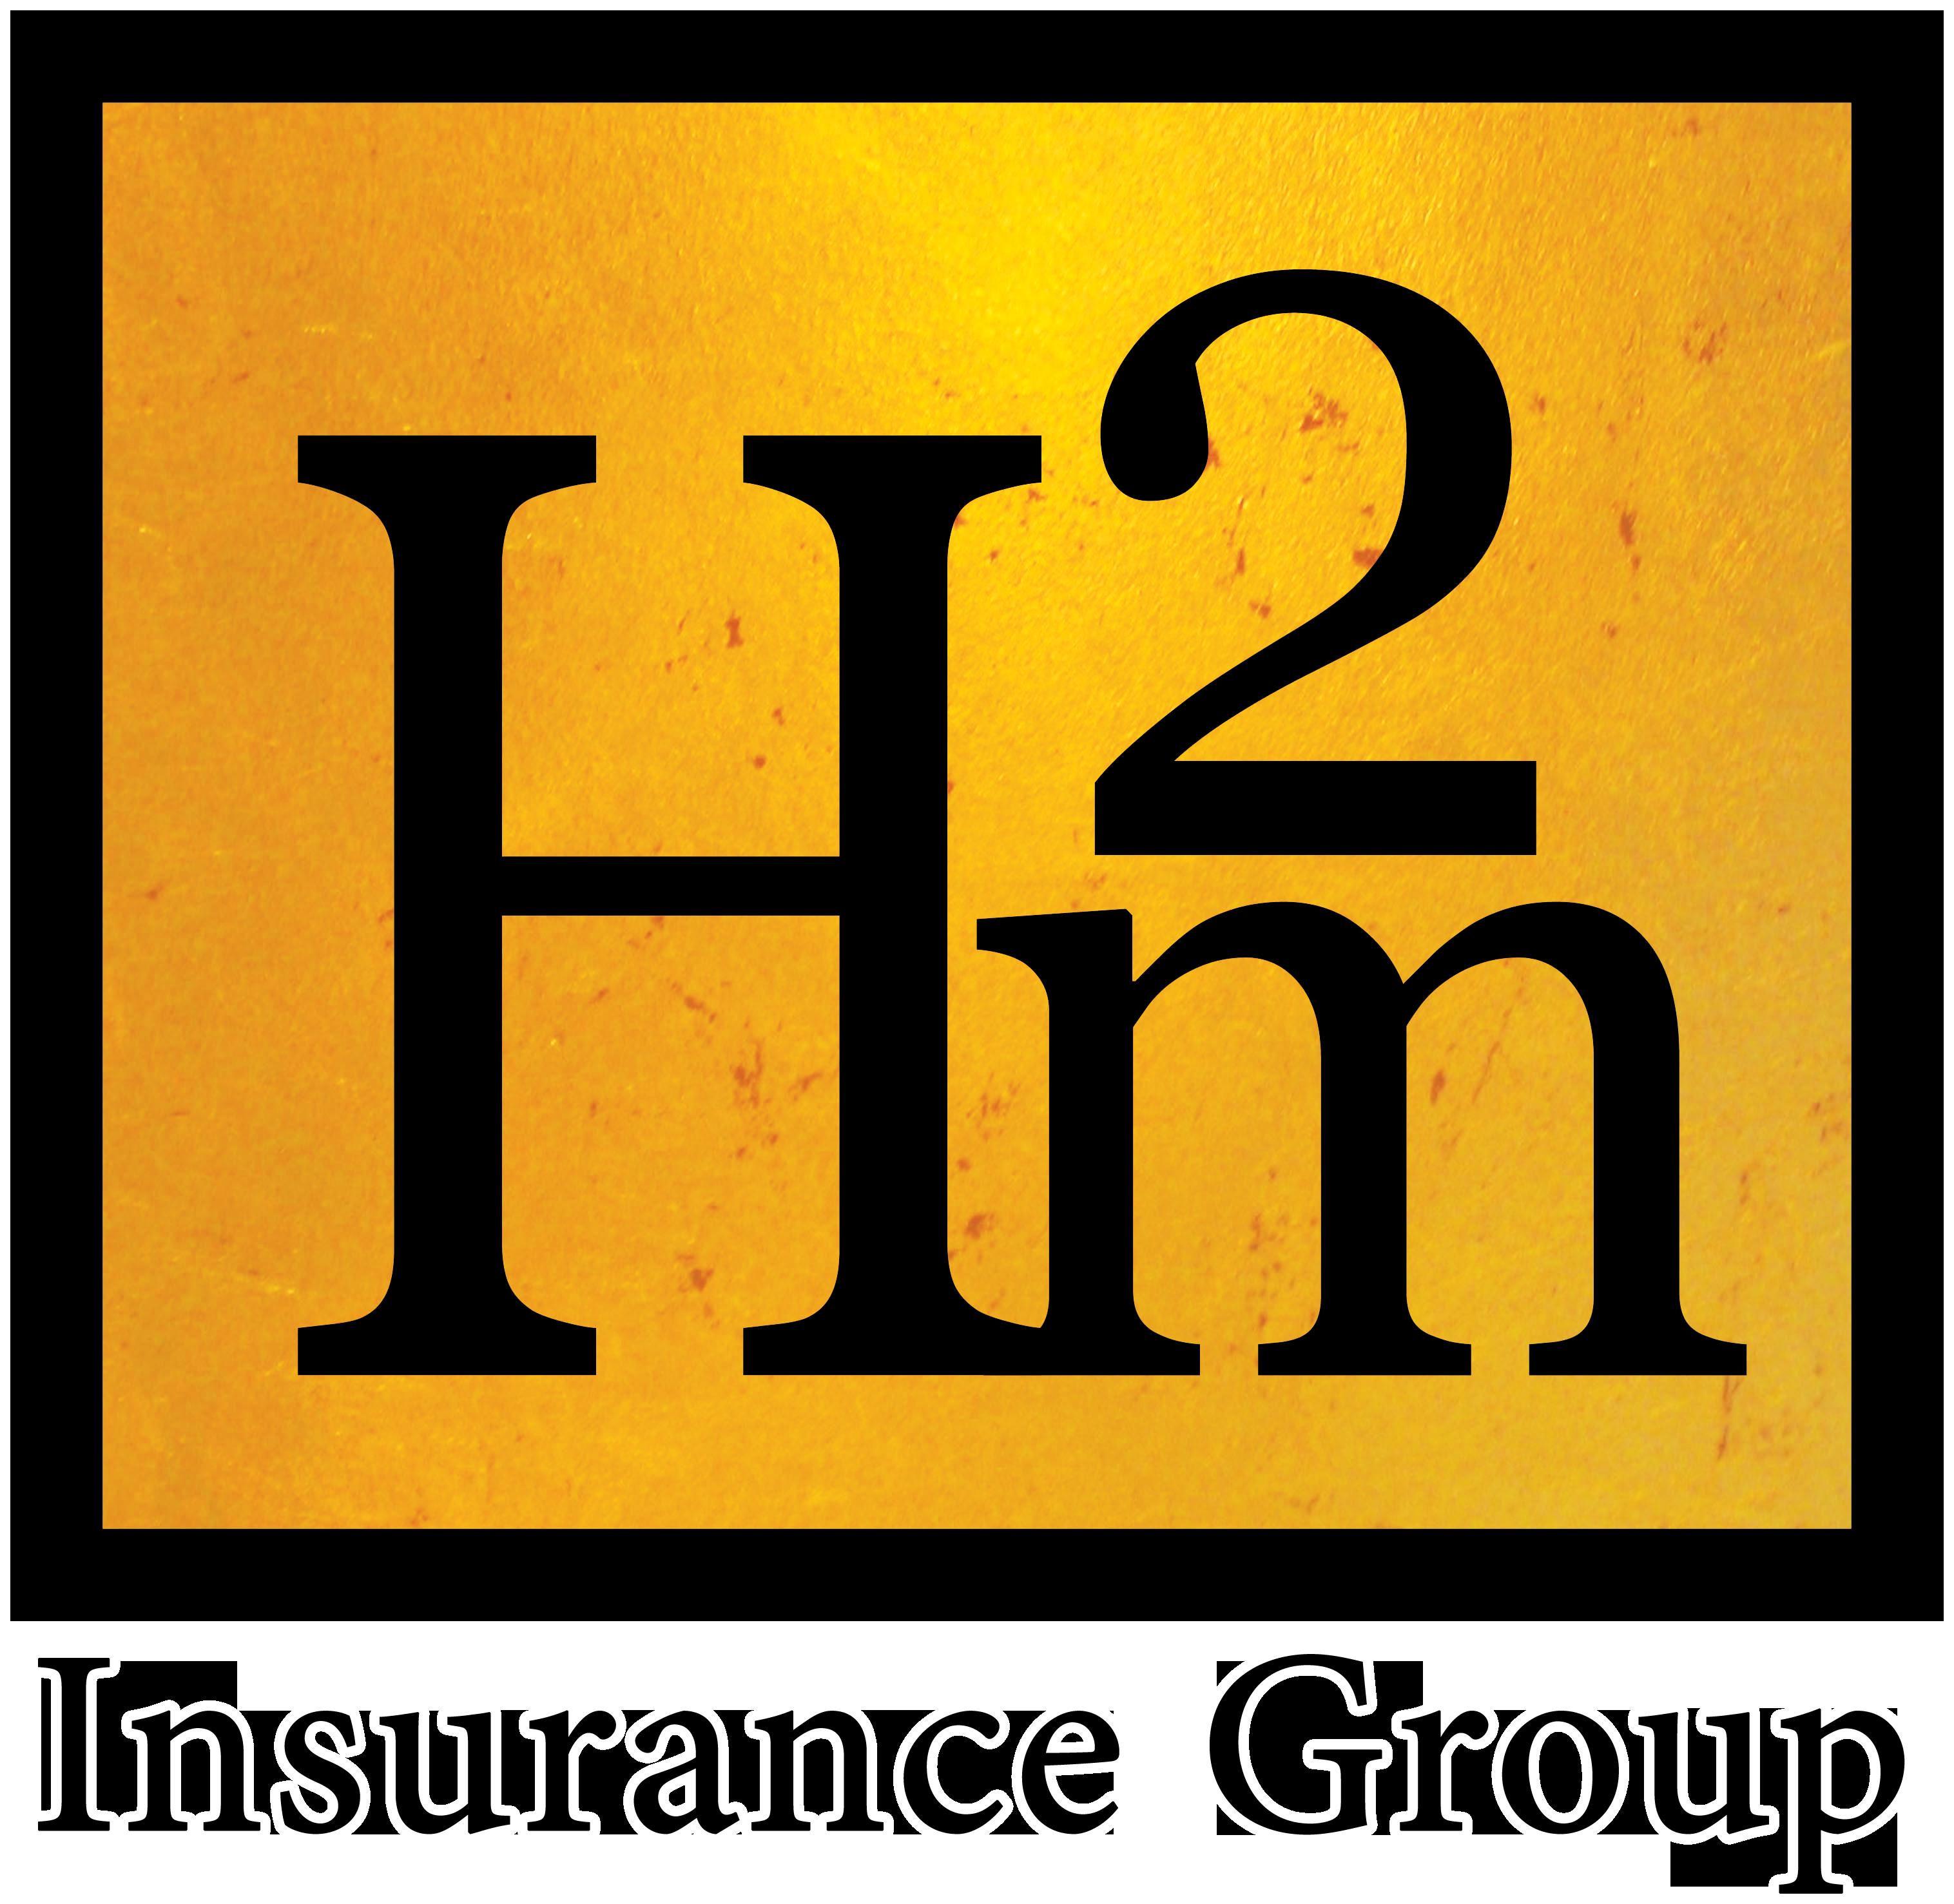 H2M Insurance Group